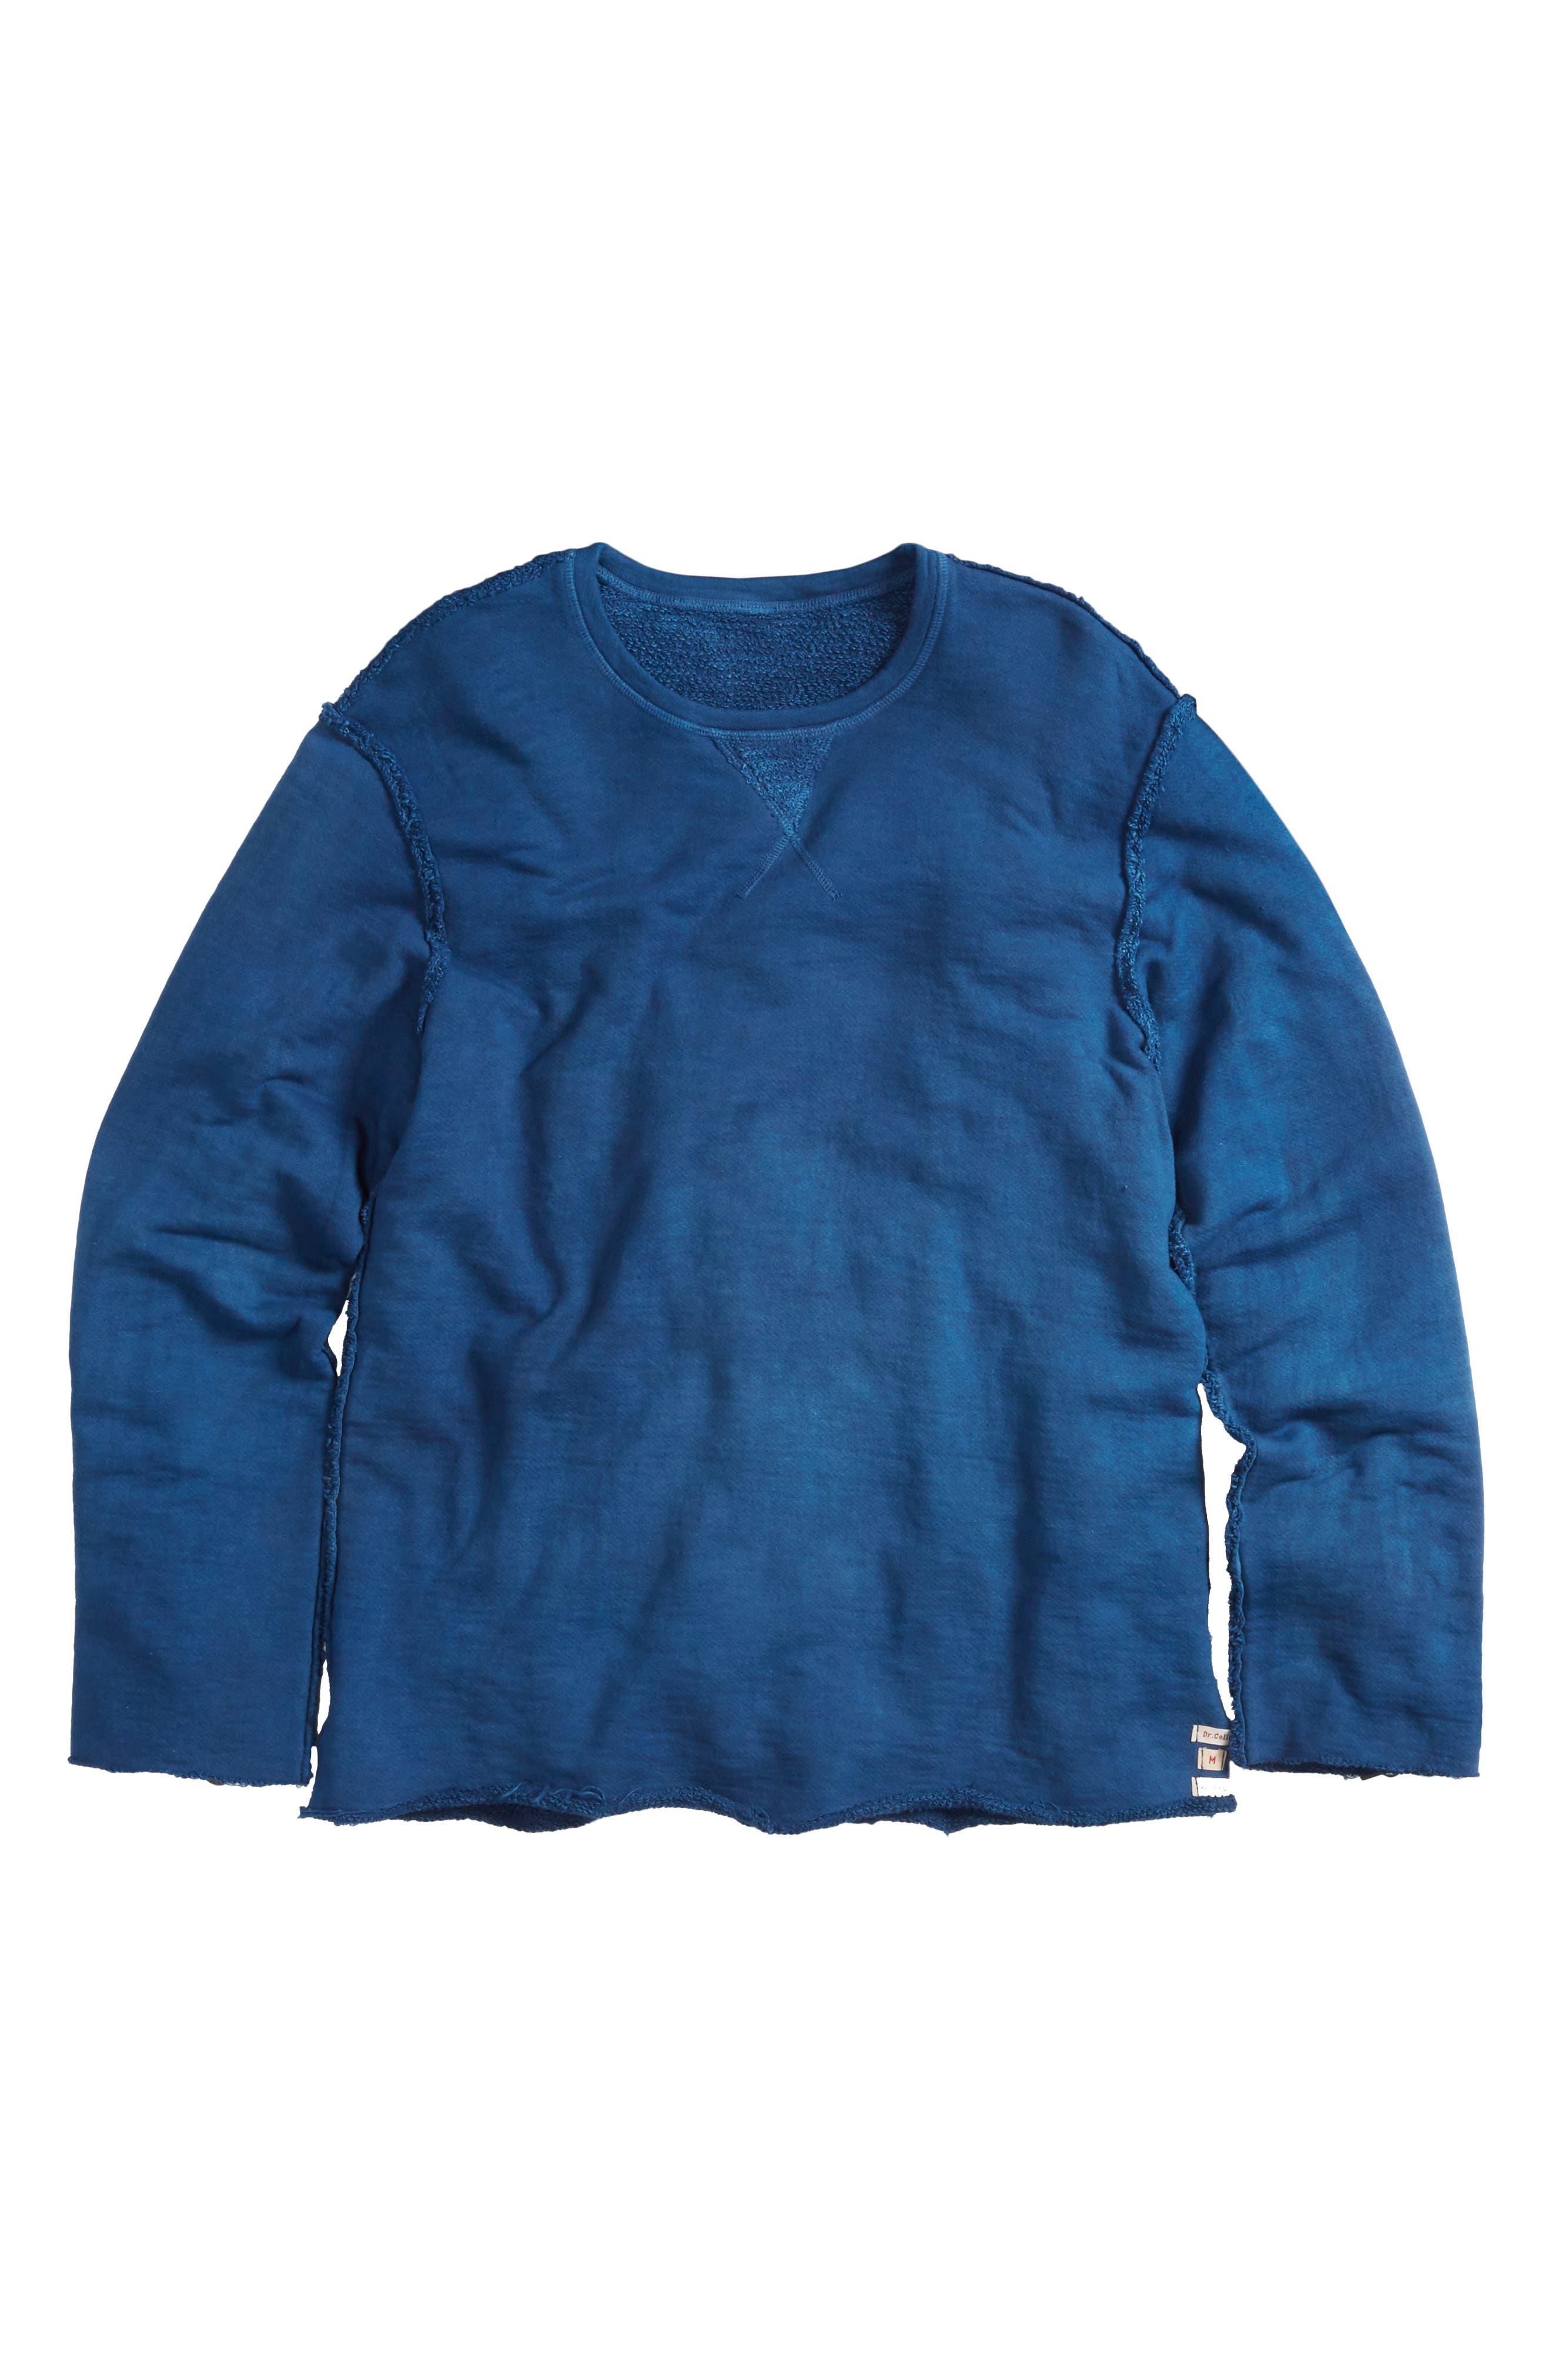 Malibu Reversible Sweatshirt,                             Main thumbnail 1, color,                             Indigo